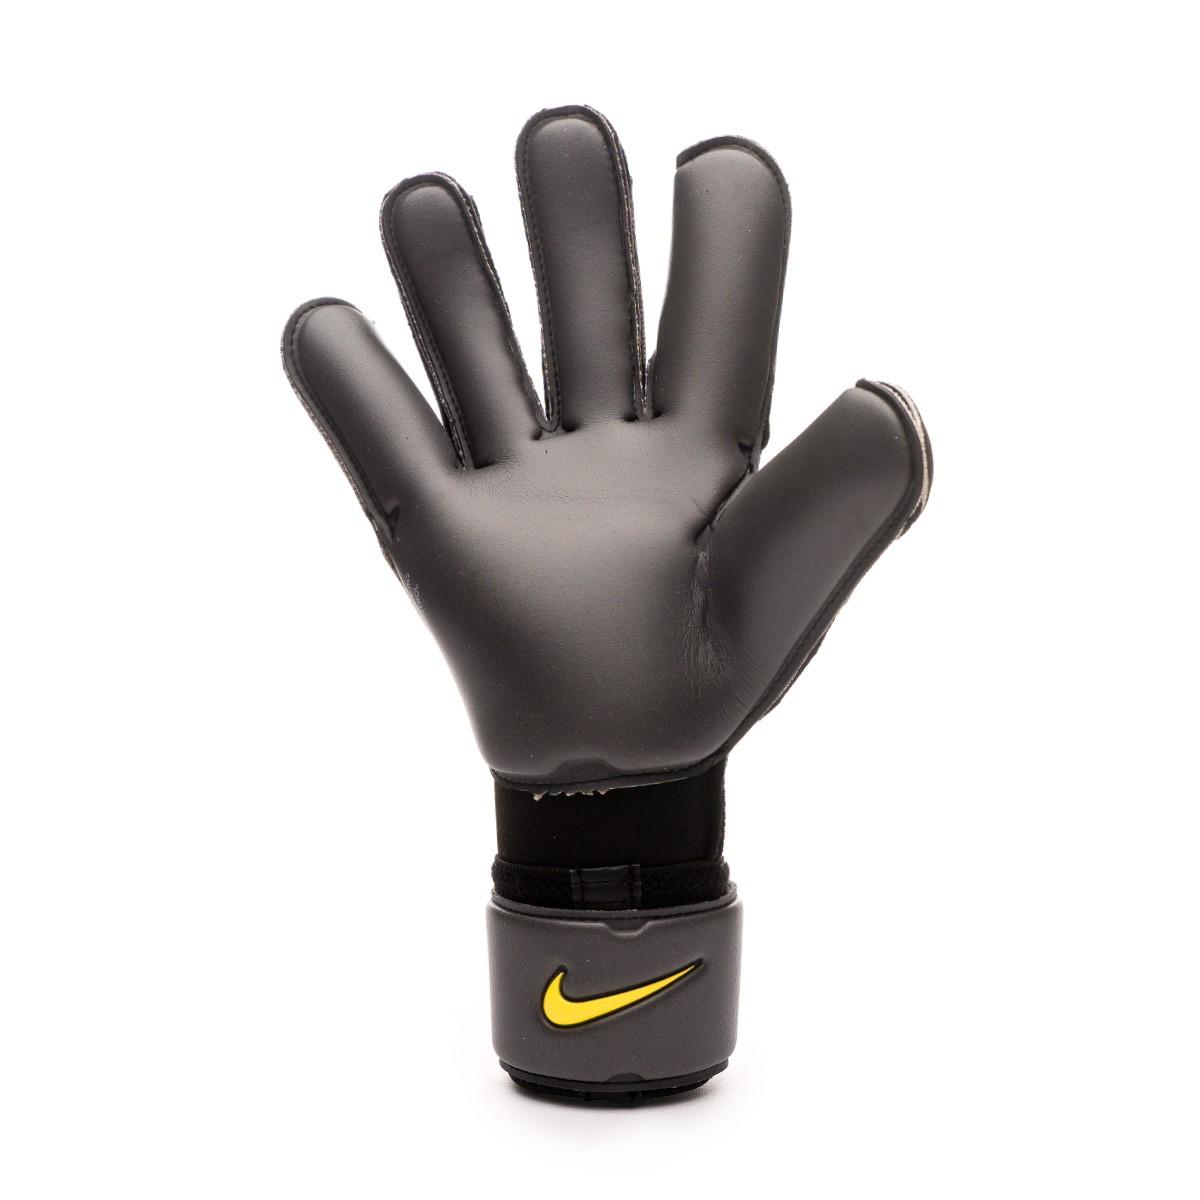 El sendero dolor siglo  Glove Nike Vapor Grip 3 Anthracite-Black-Optical yellow - Football store  Fútbol Emotion